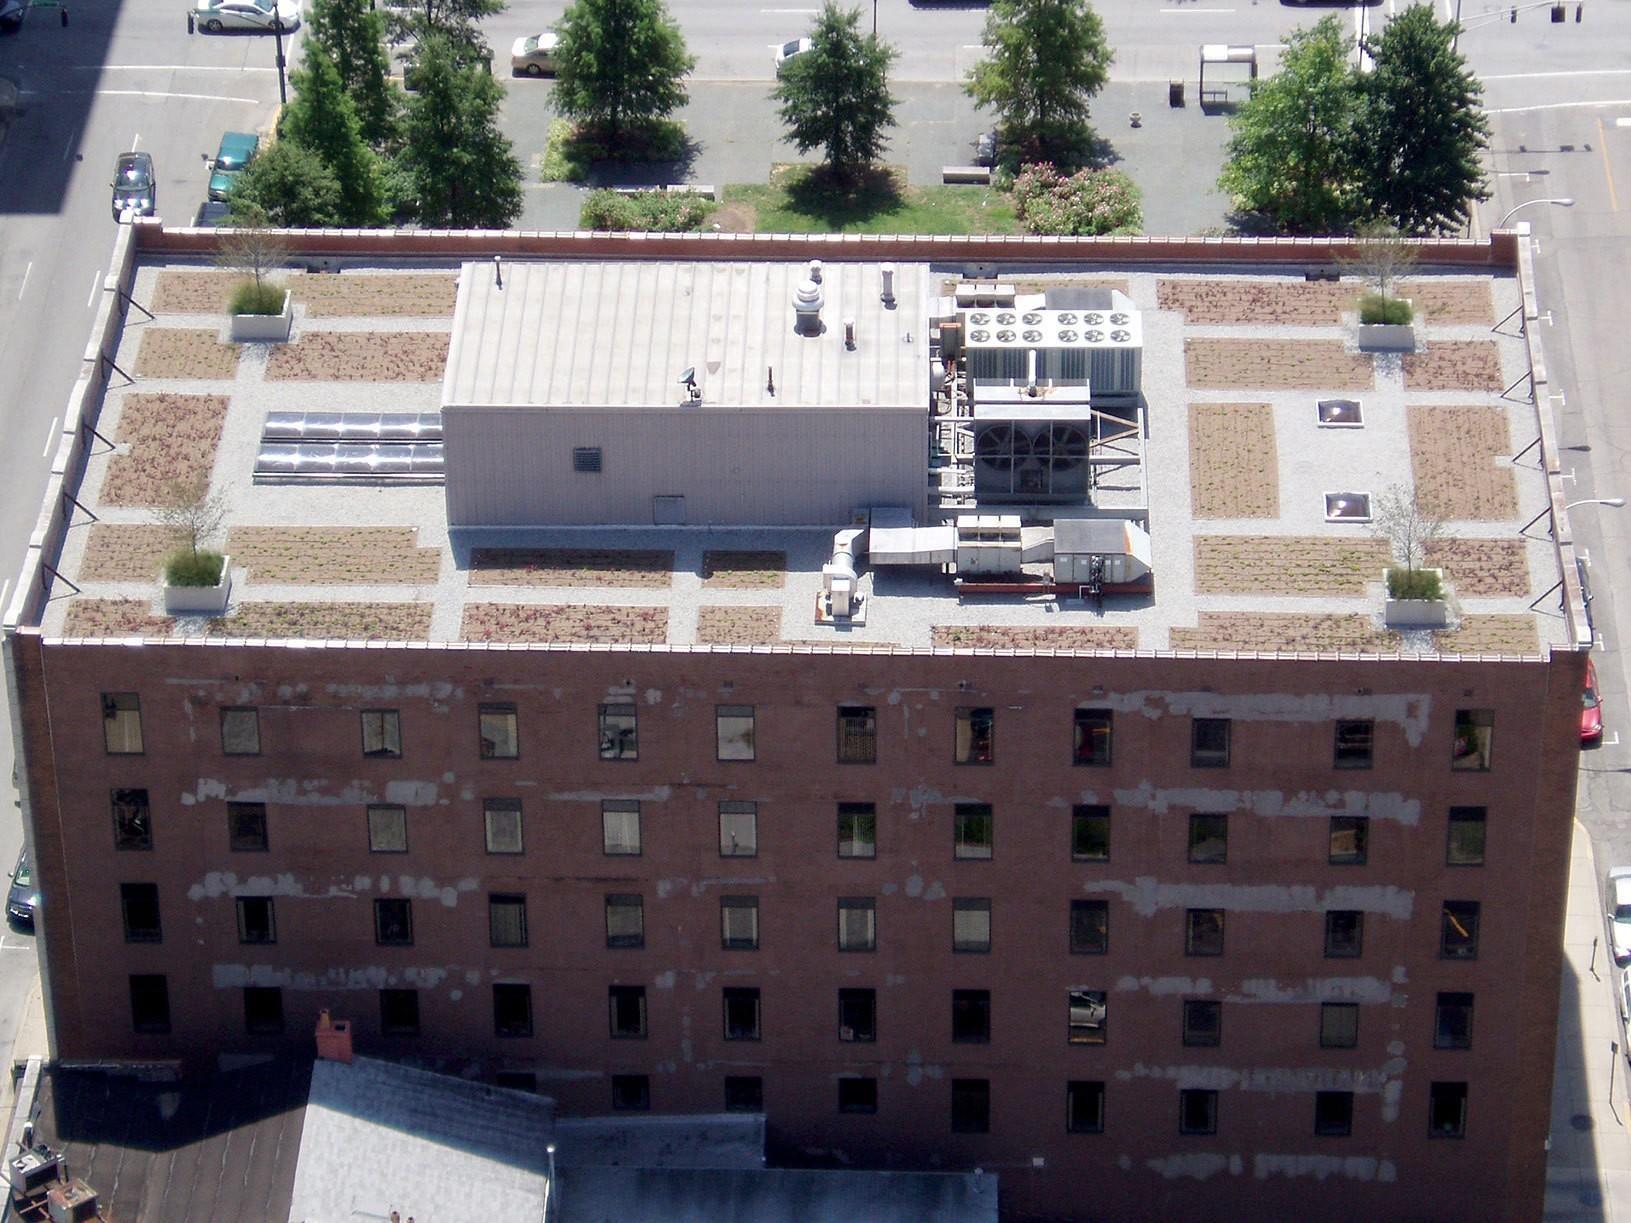 louisville-metro-government-metro-development-center-green-roof-aerial